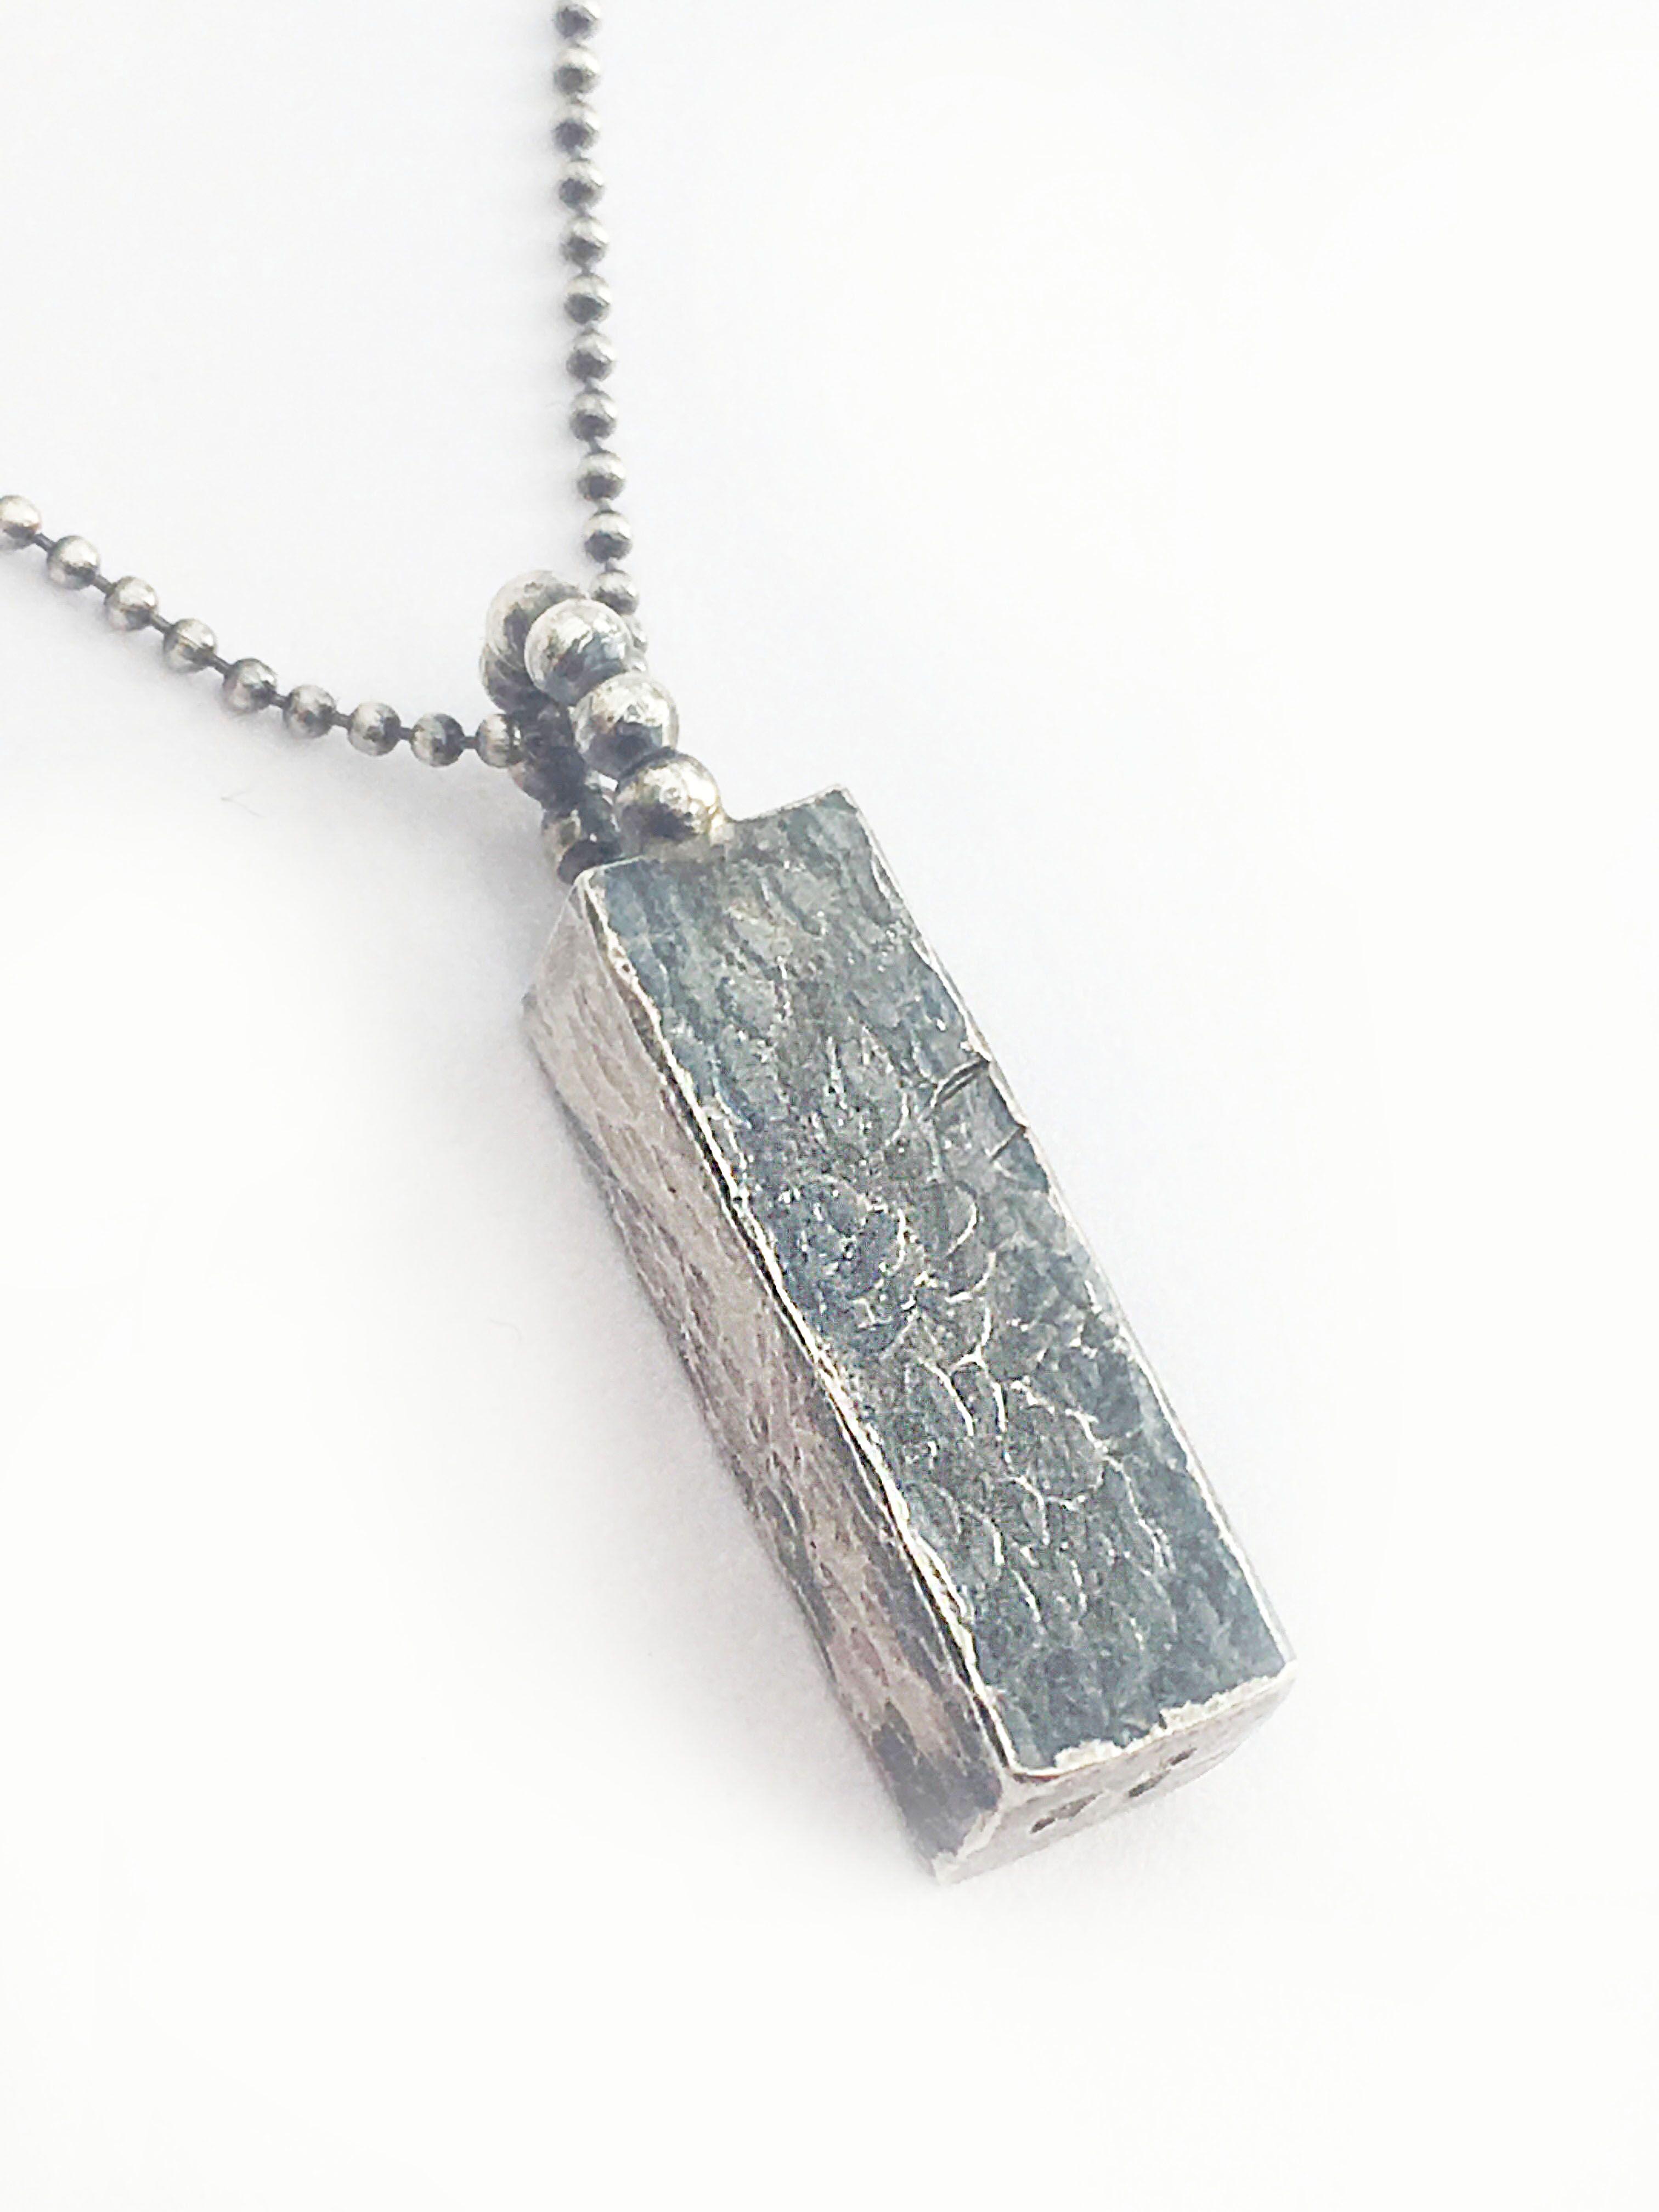 A chunky handmade silver pendant mirrors the rocks